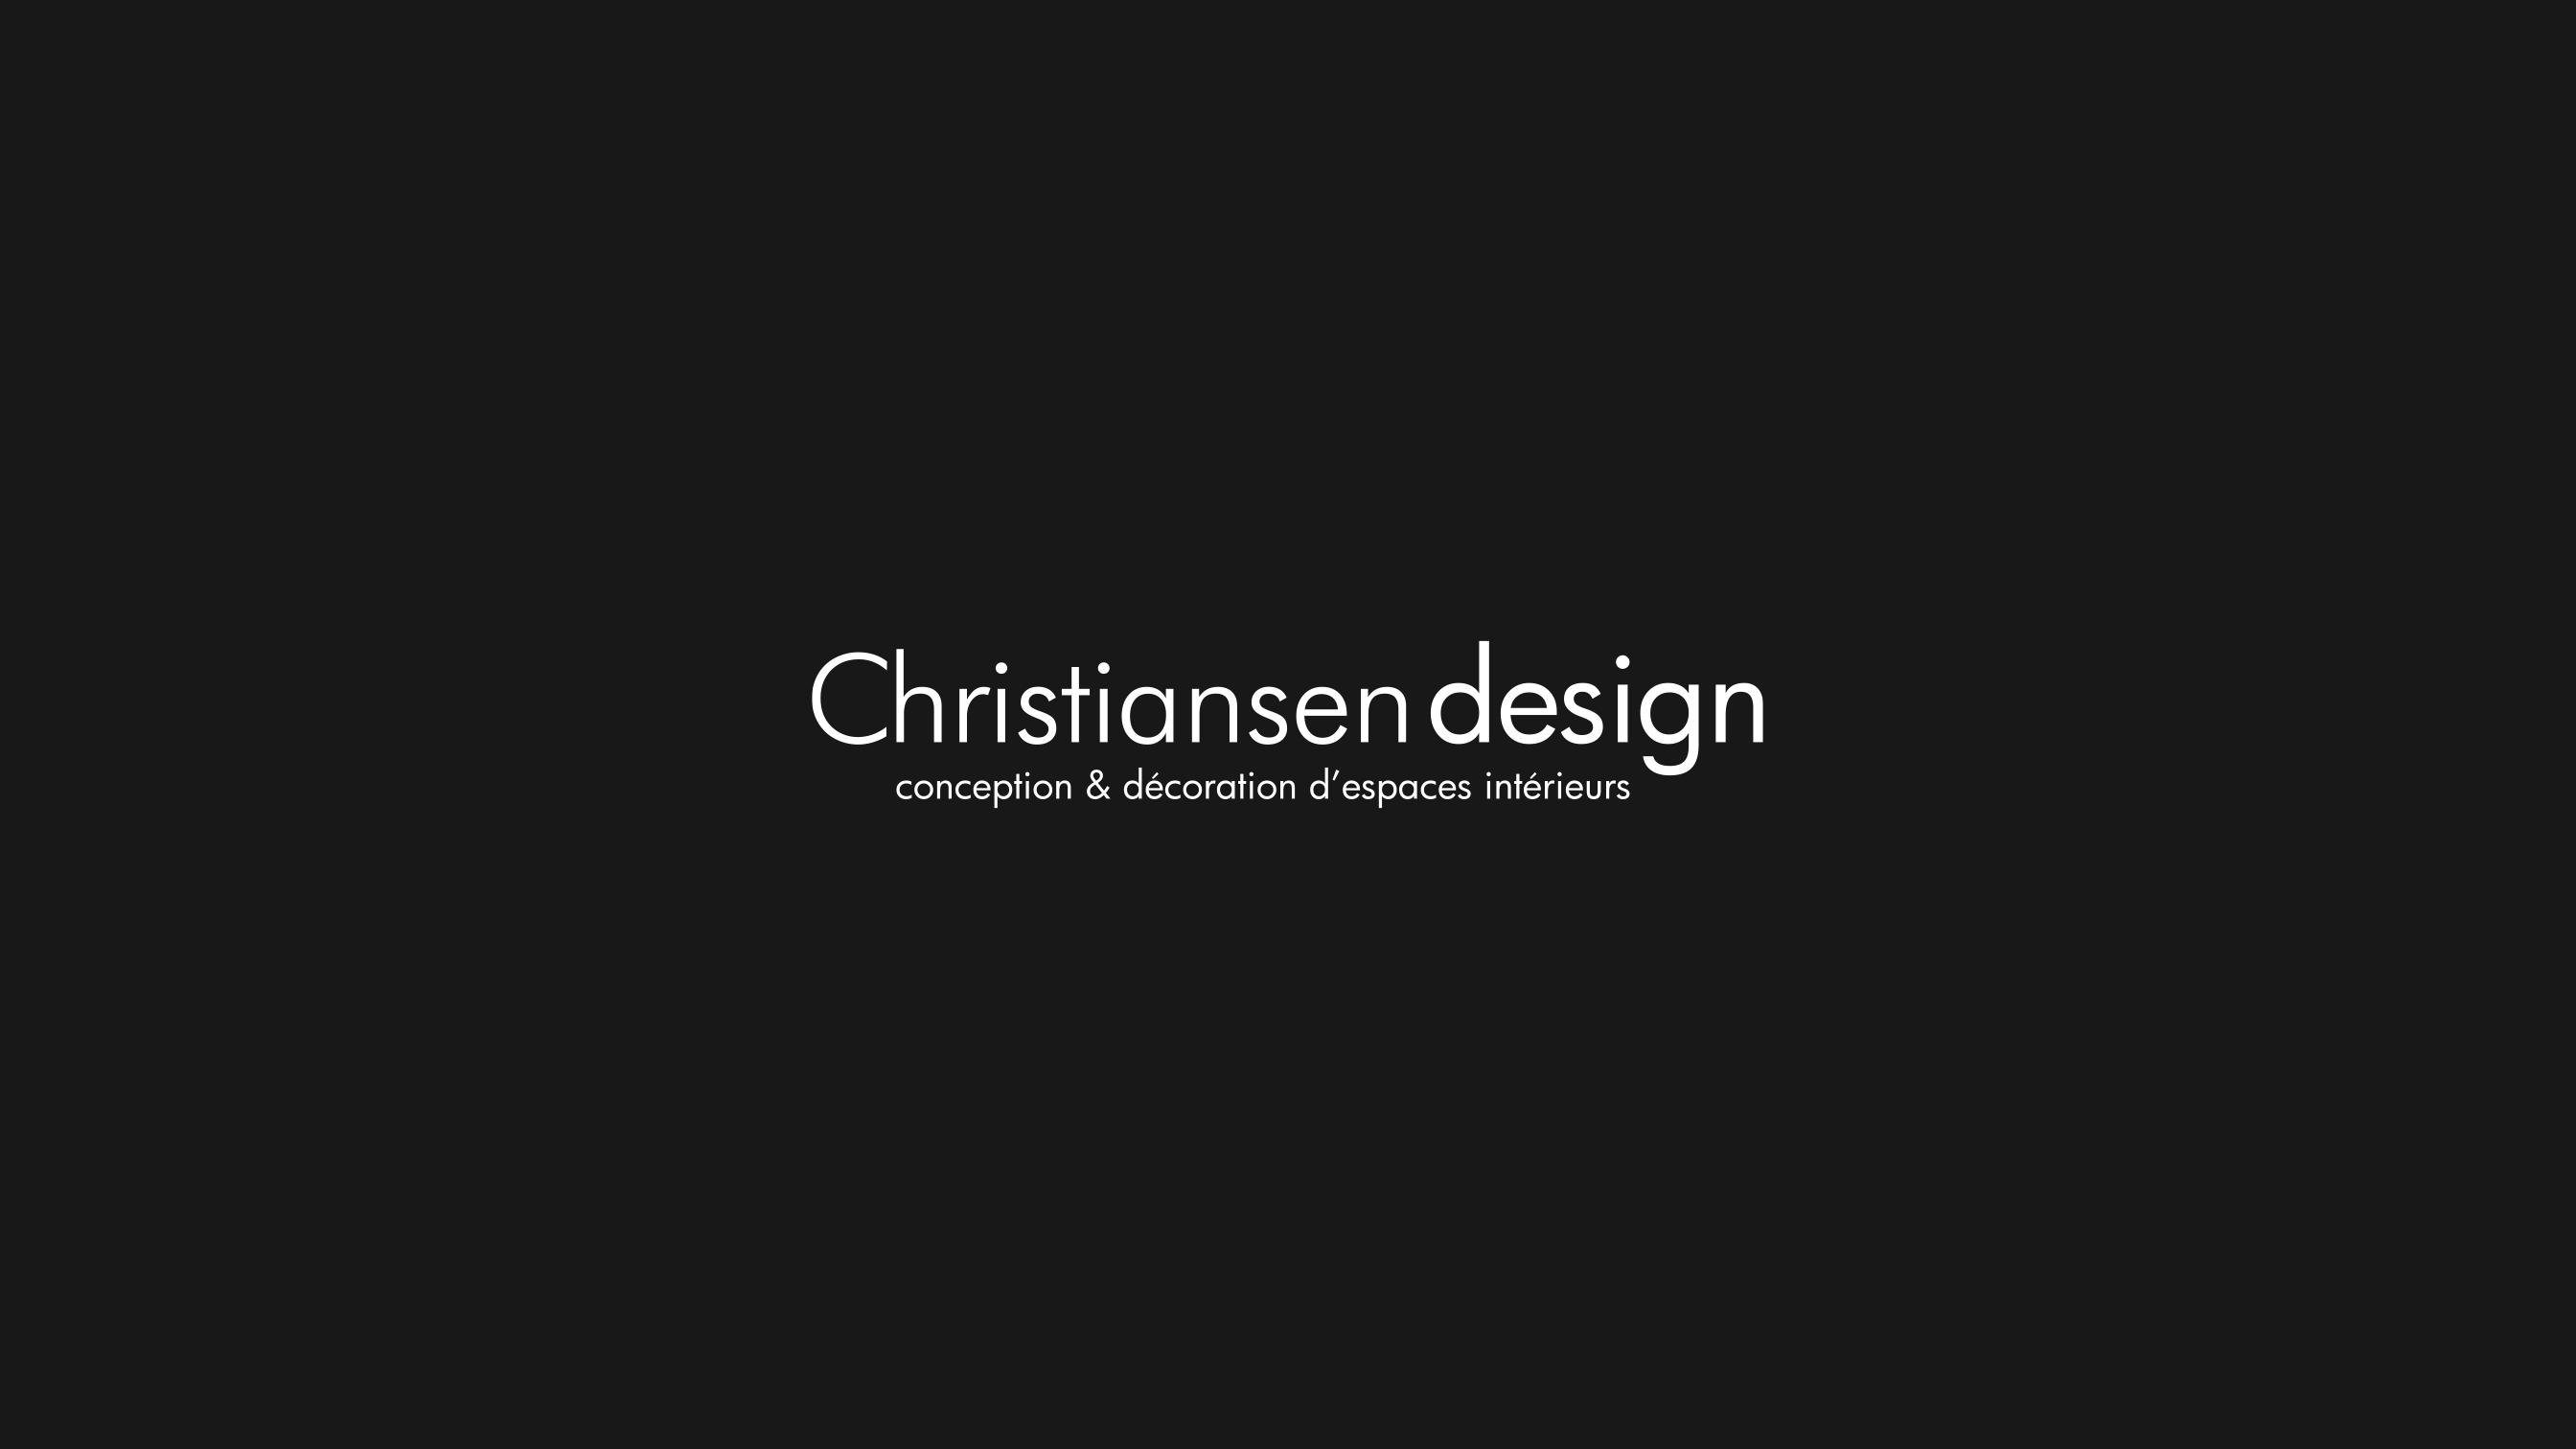 showcase-logotype-christiansen